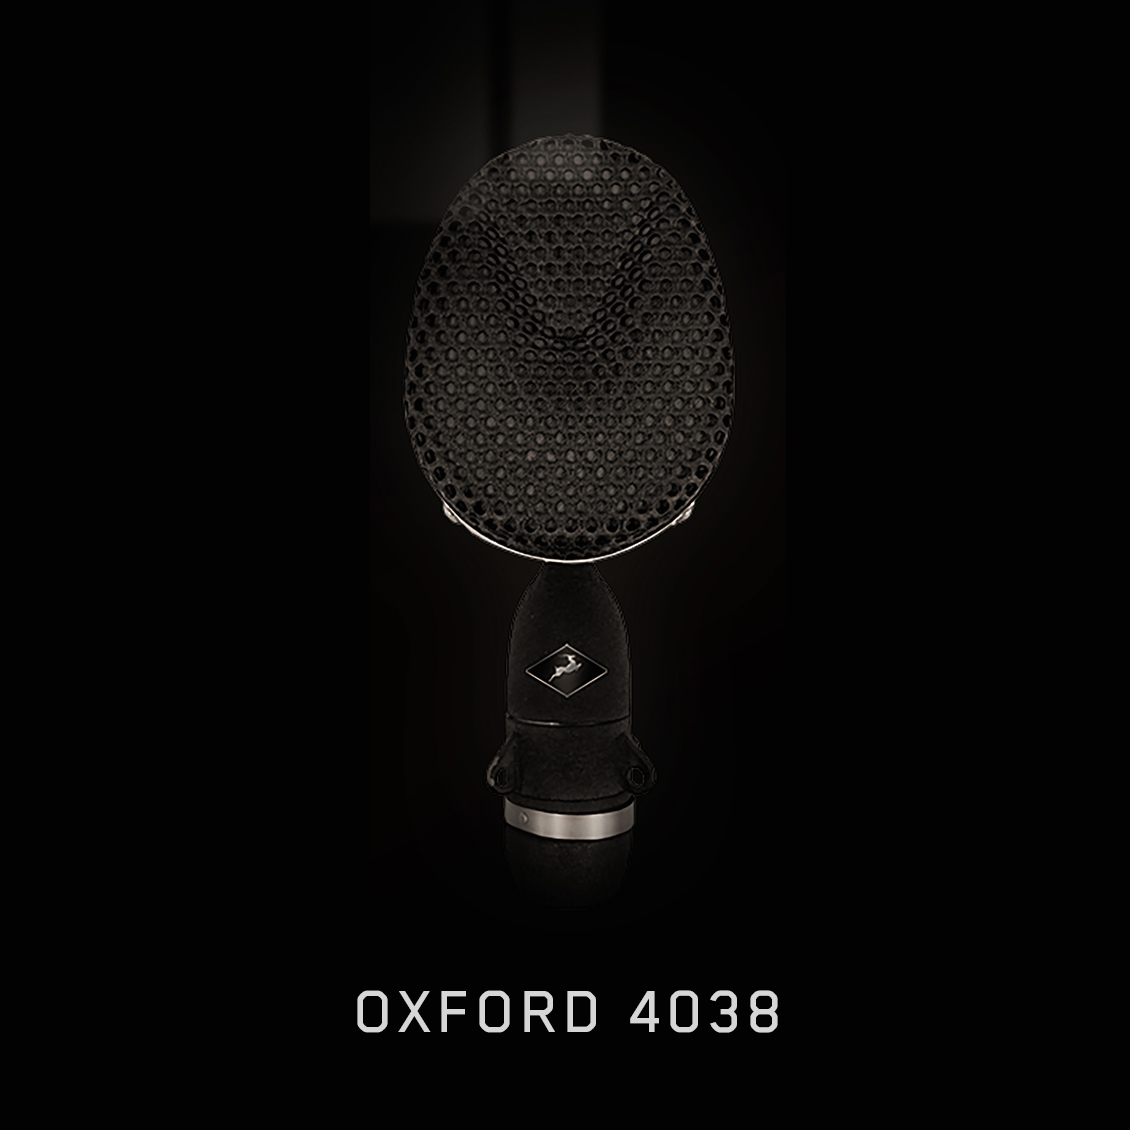 Oxford 4038 2